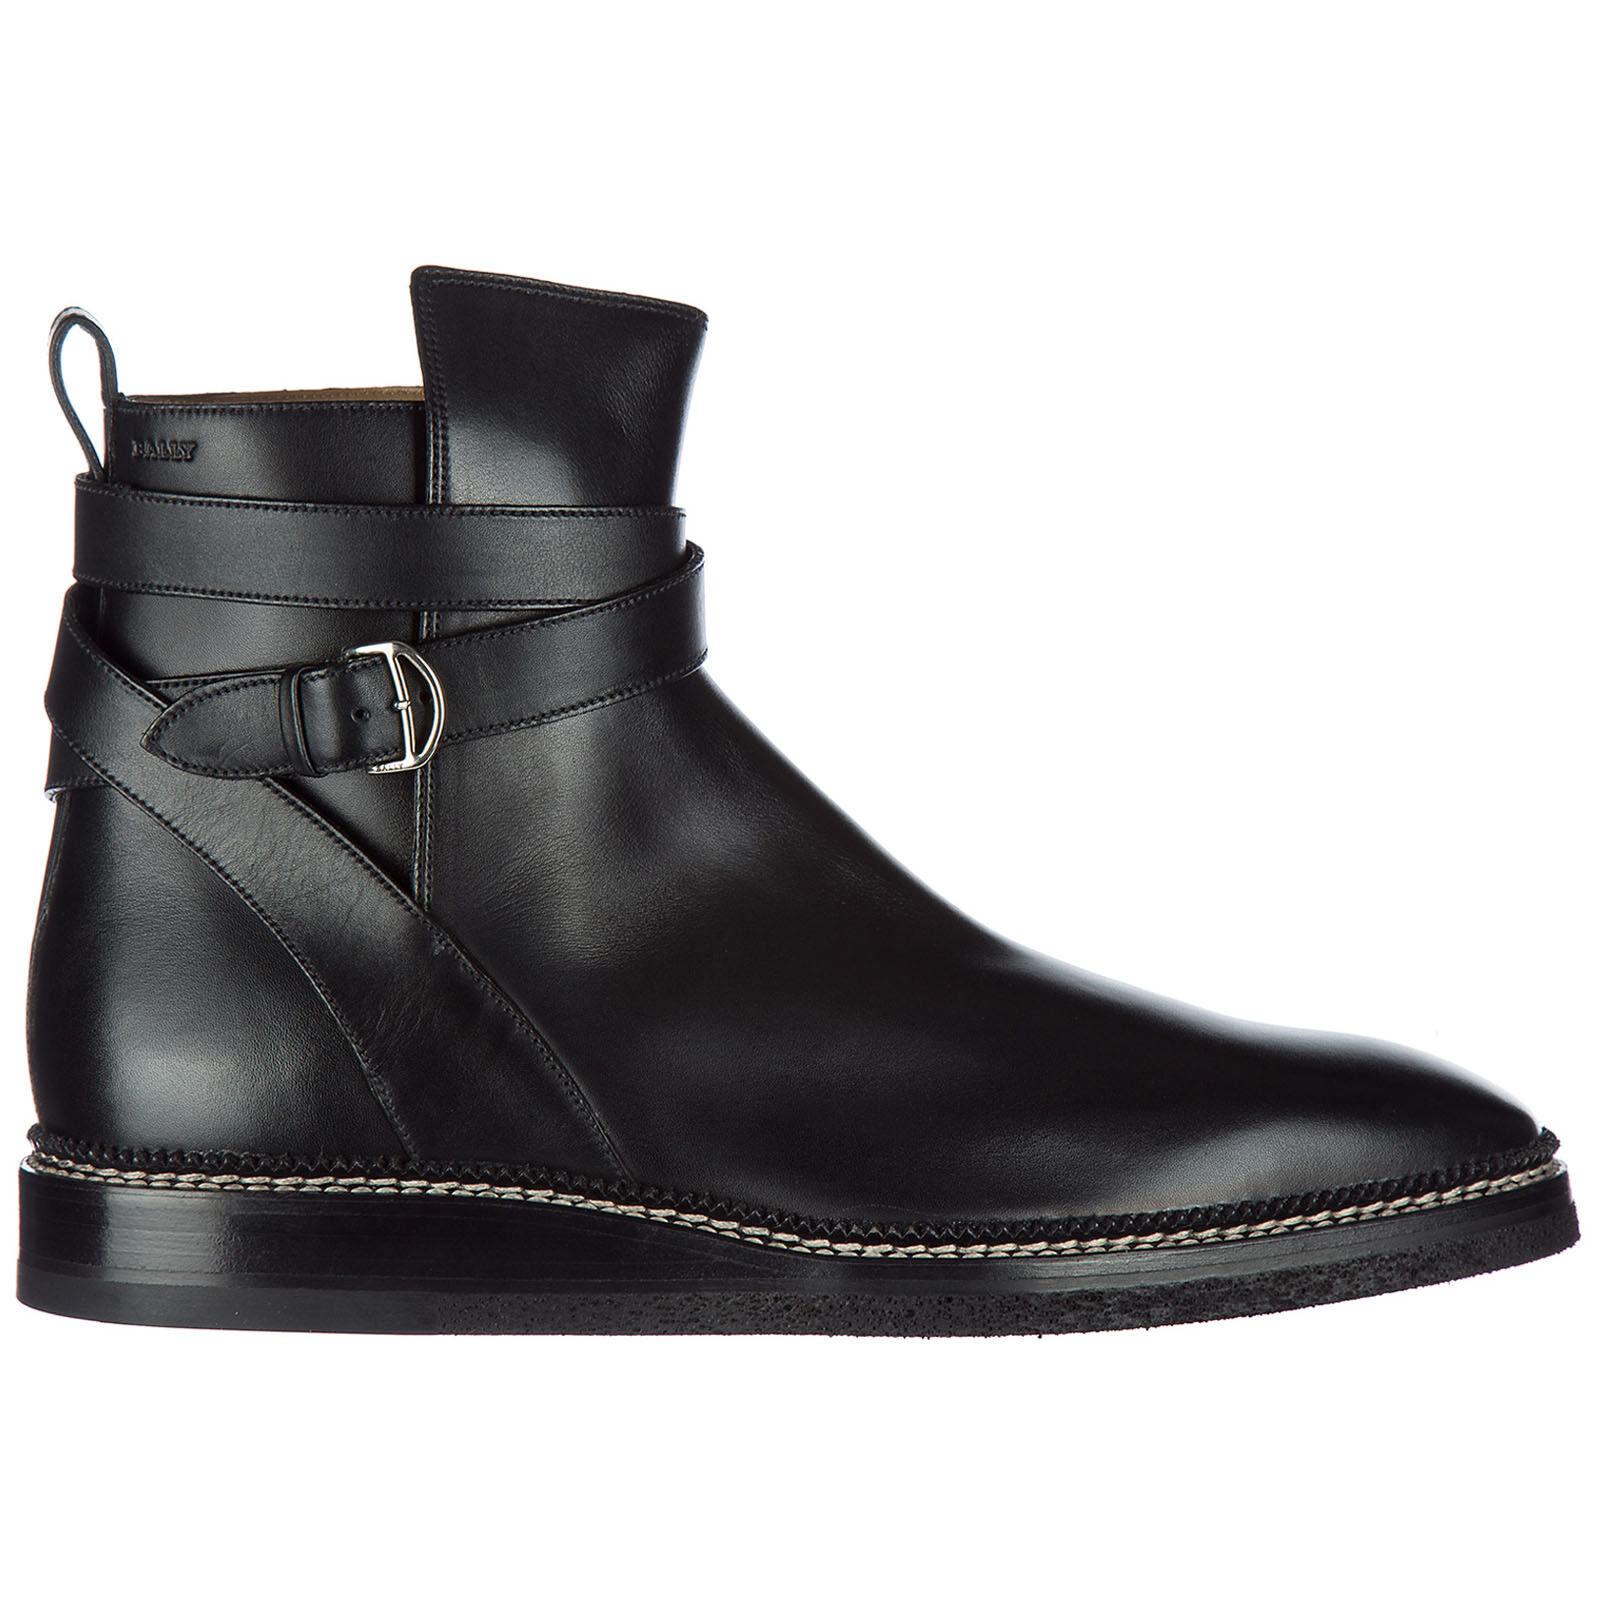 BALLY MEN S GENUINE LEATHER ANKLE BOOTS NEW LEJOR BLACK 7D2   eBay 464e032d9d